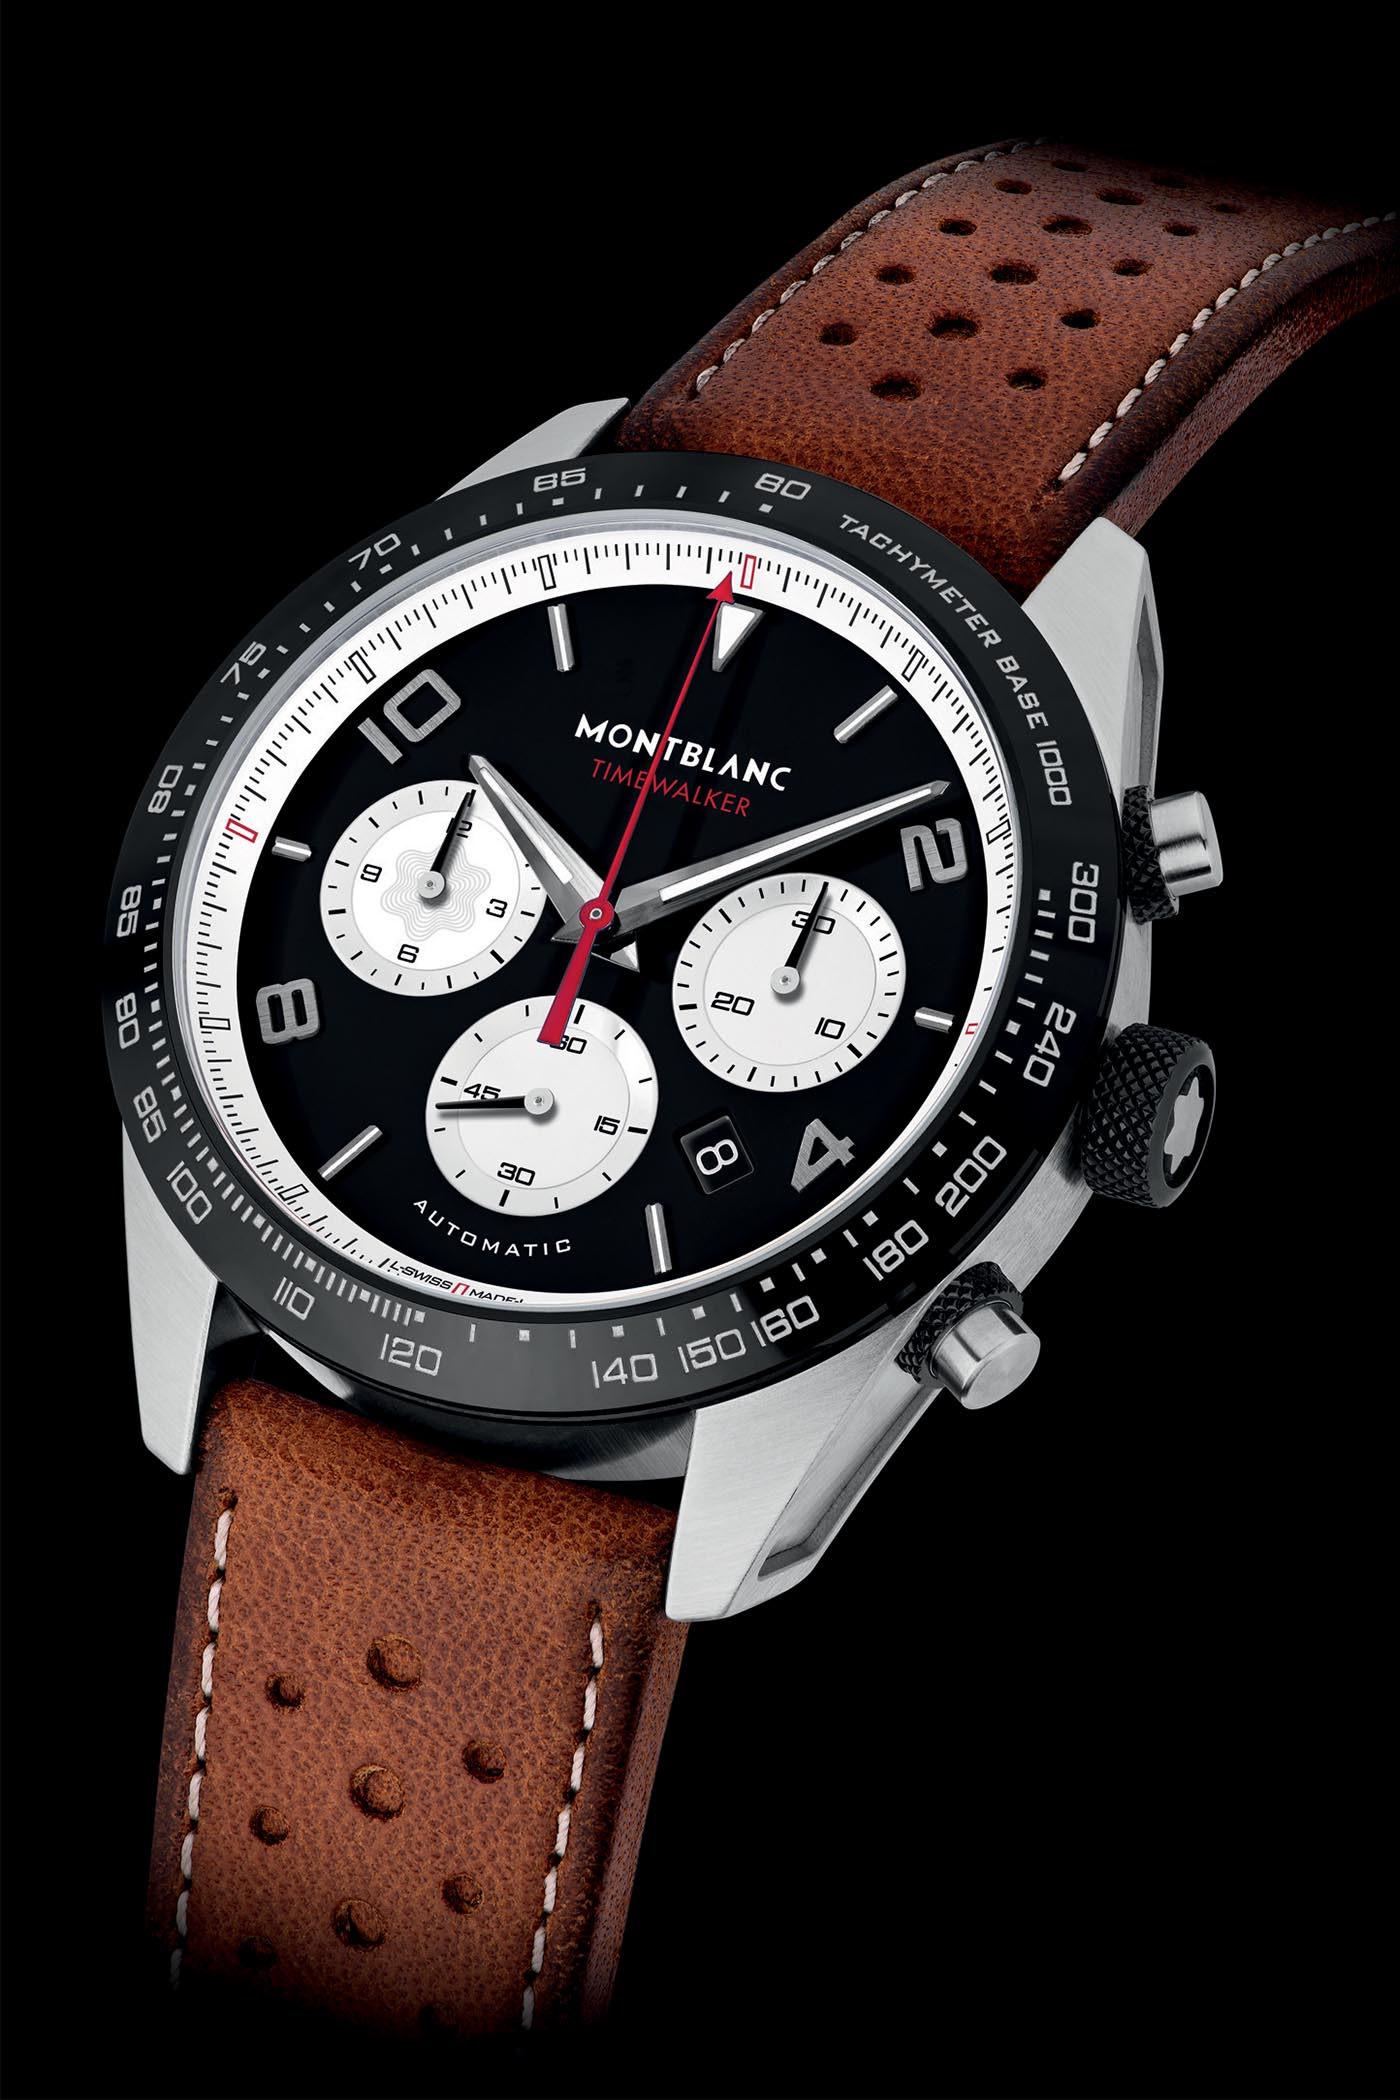 Pre-SIHH 2019 - Montblanc TimeWalker Reverse Panda Chronographs - 3